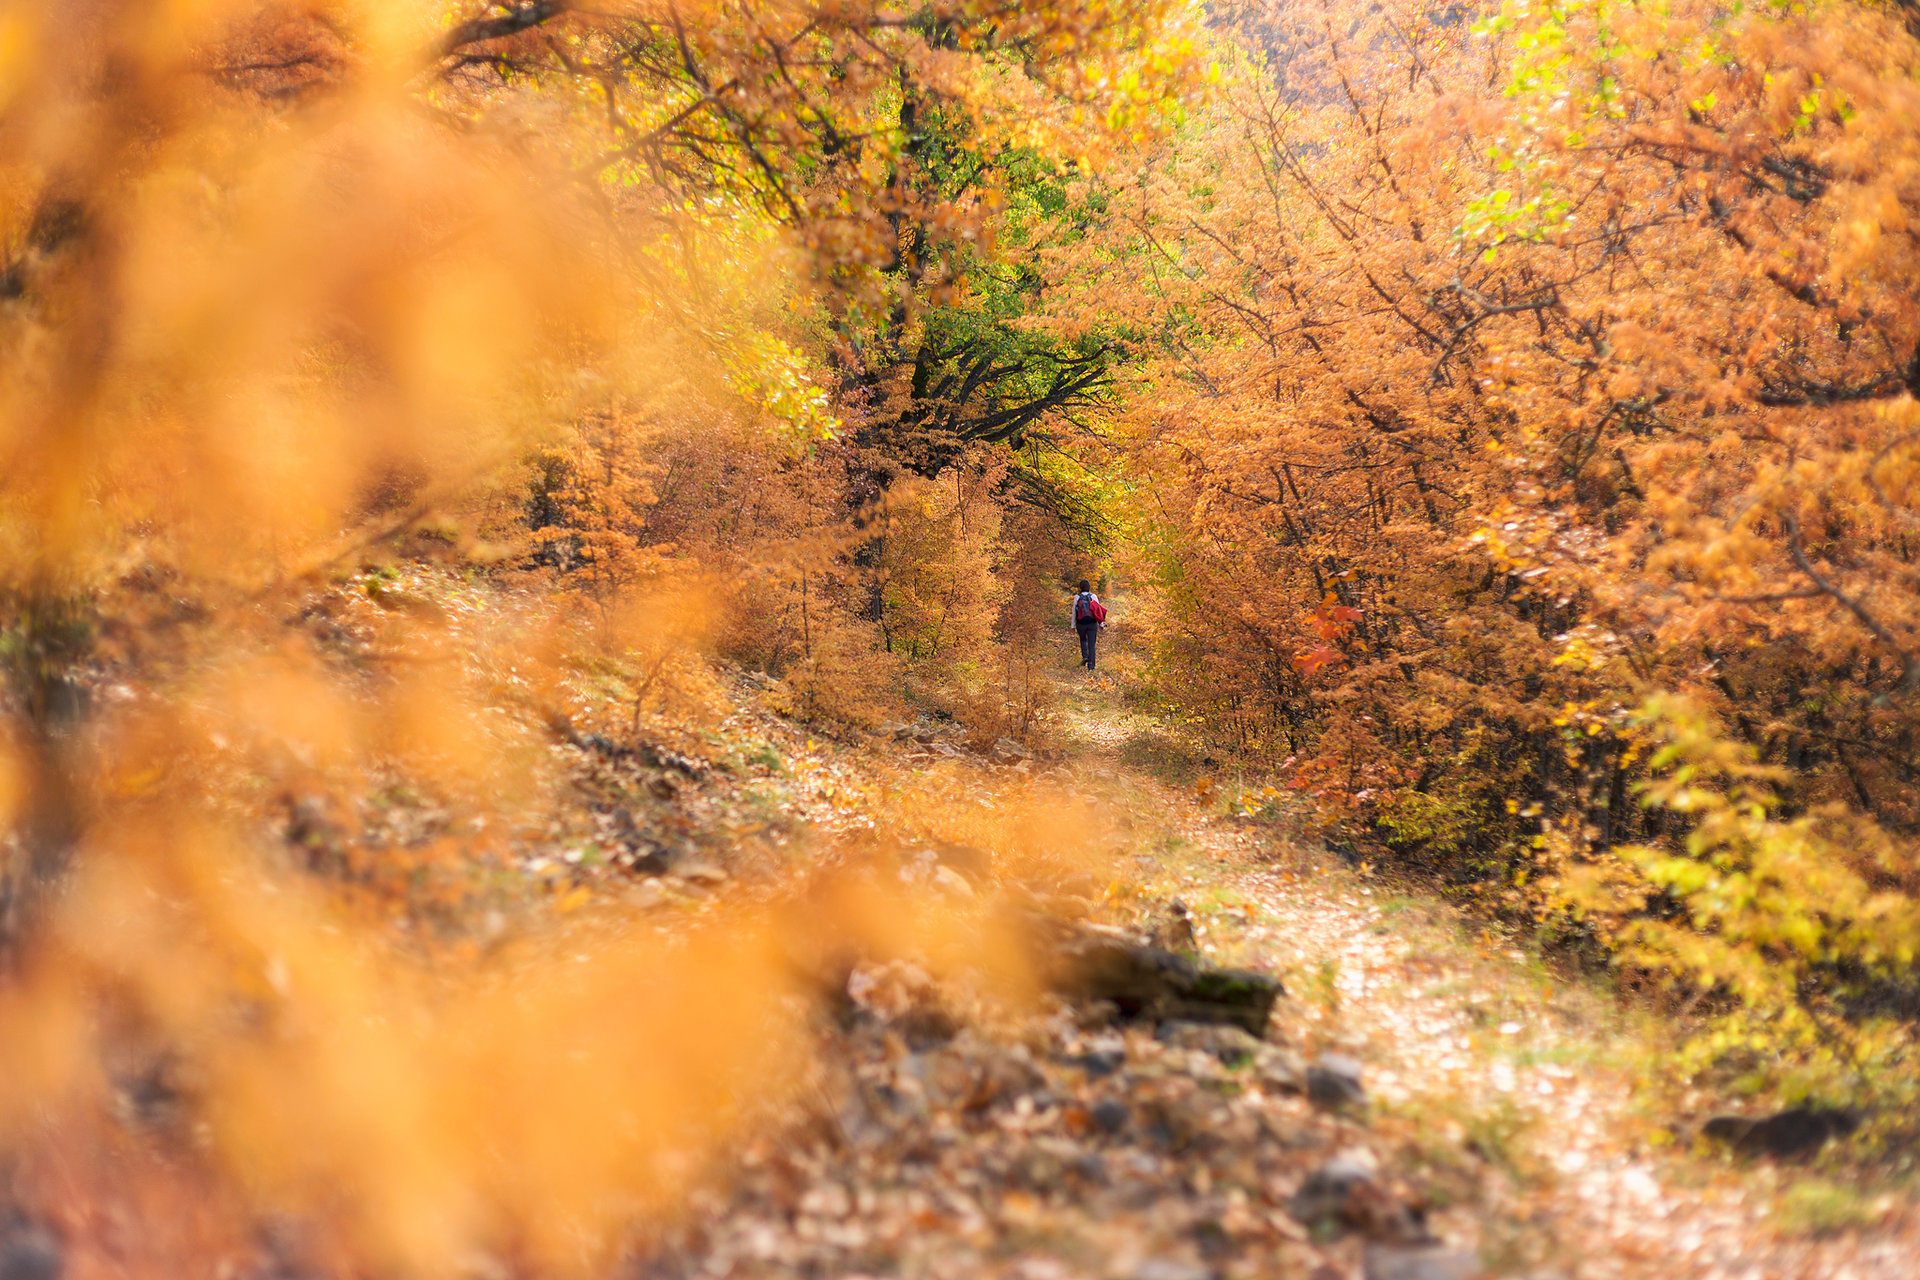 През тунела на дните от есента на мечтите | Author Tyuncher Eminov - tyunkata | PHOTO FORUM